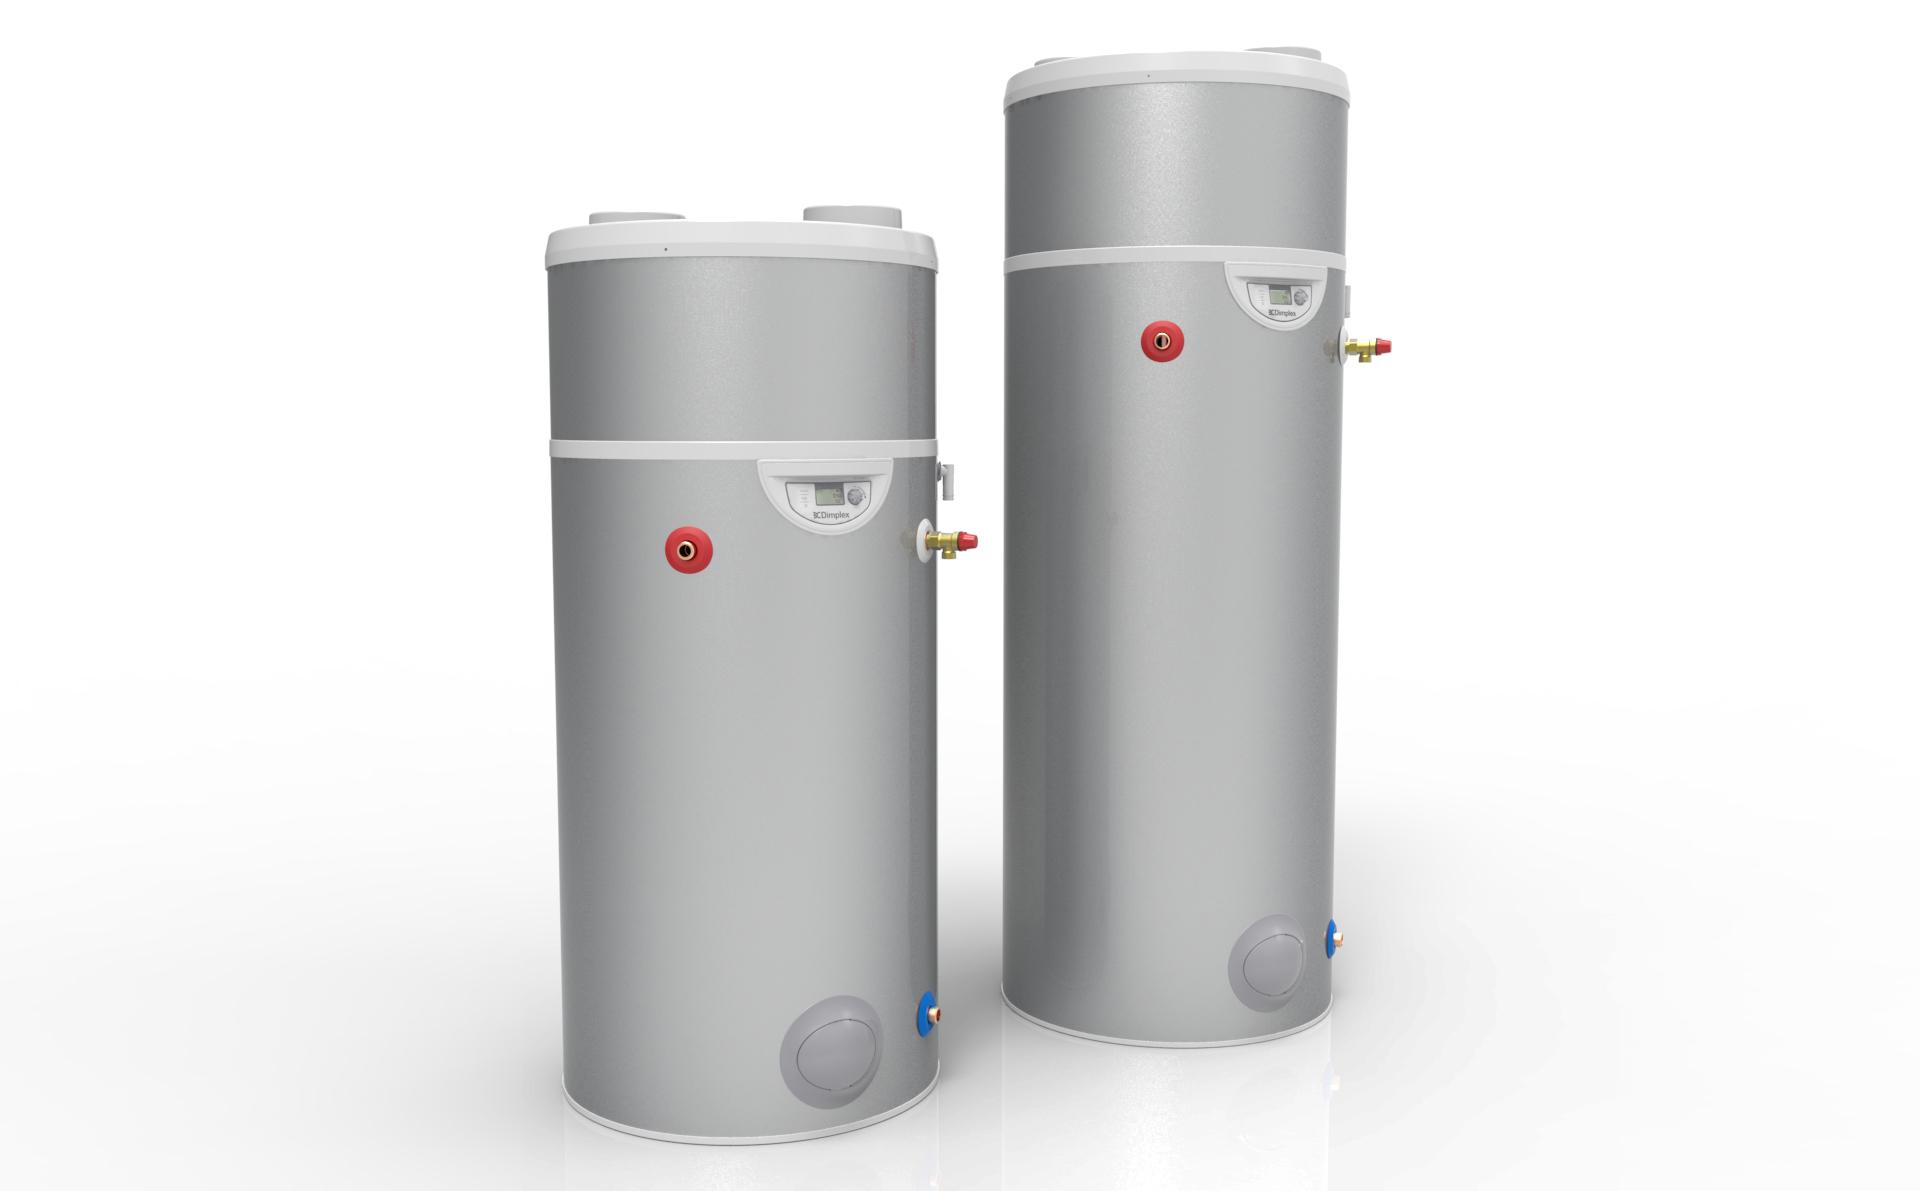 Edel Hot Water Heat Pump Solus